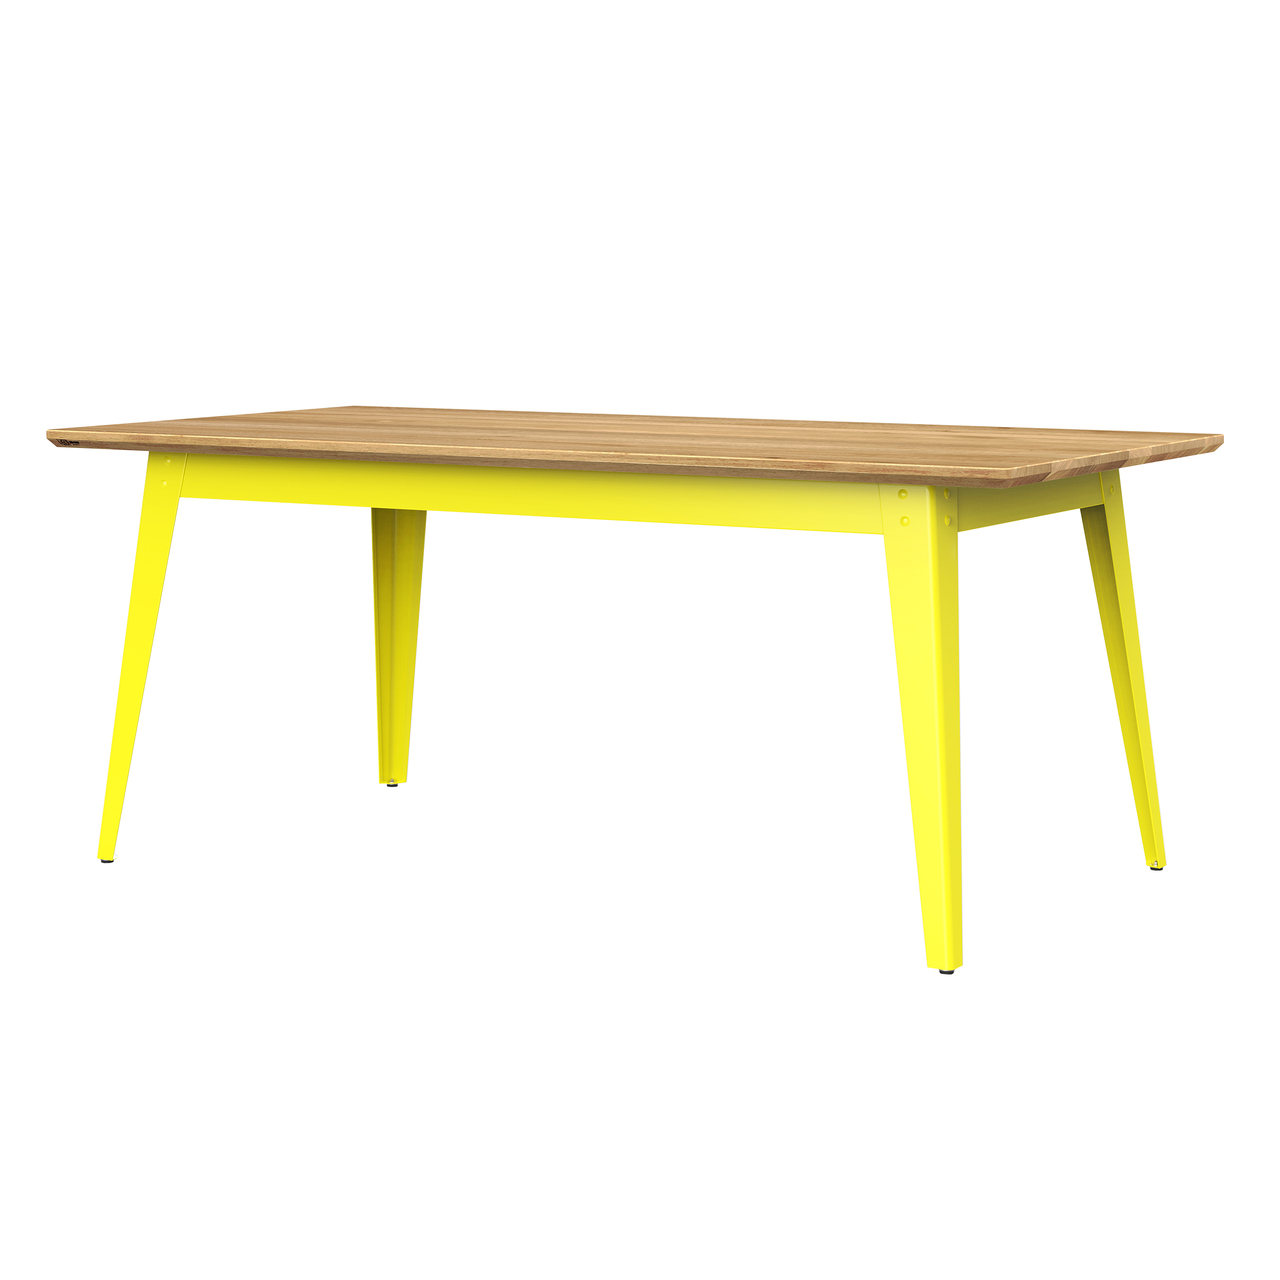 Jan Cray 6Grad Tisch Holz Schwefelgelb, Eichenholz geölt, B: 70 cm / L: 120 cm